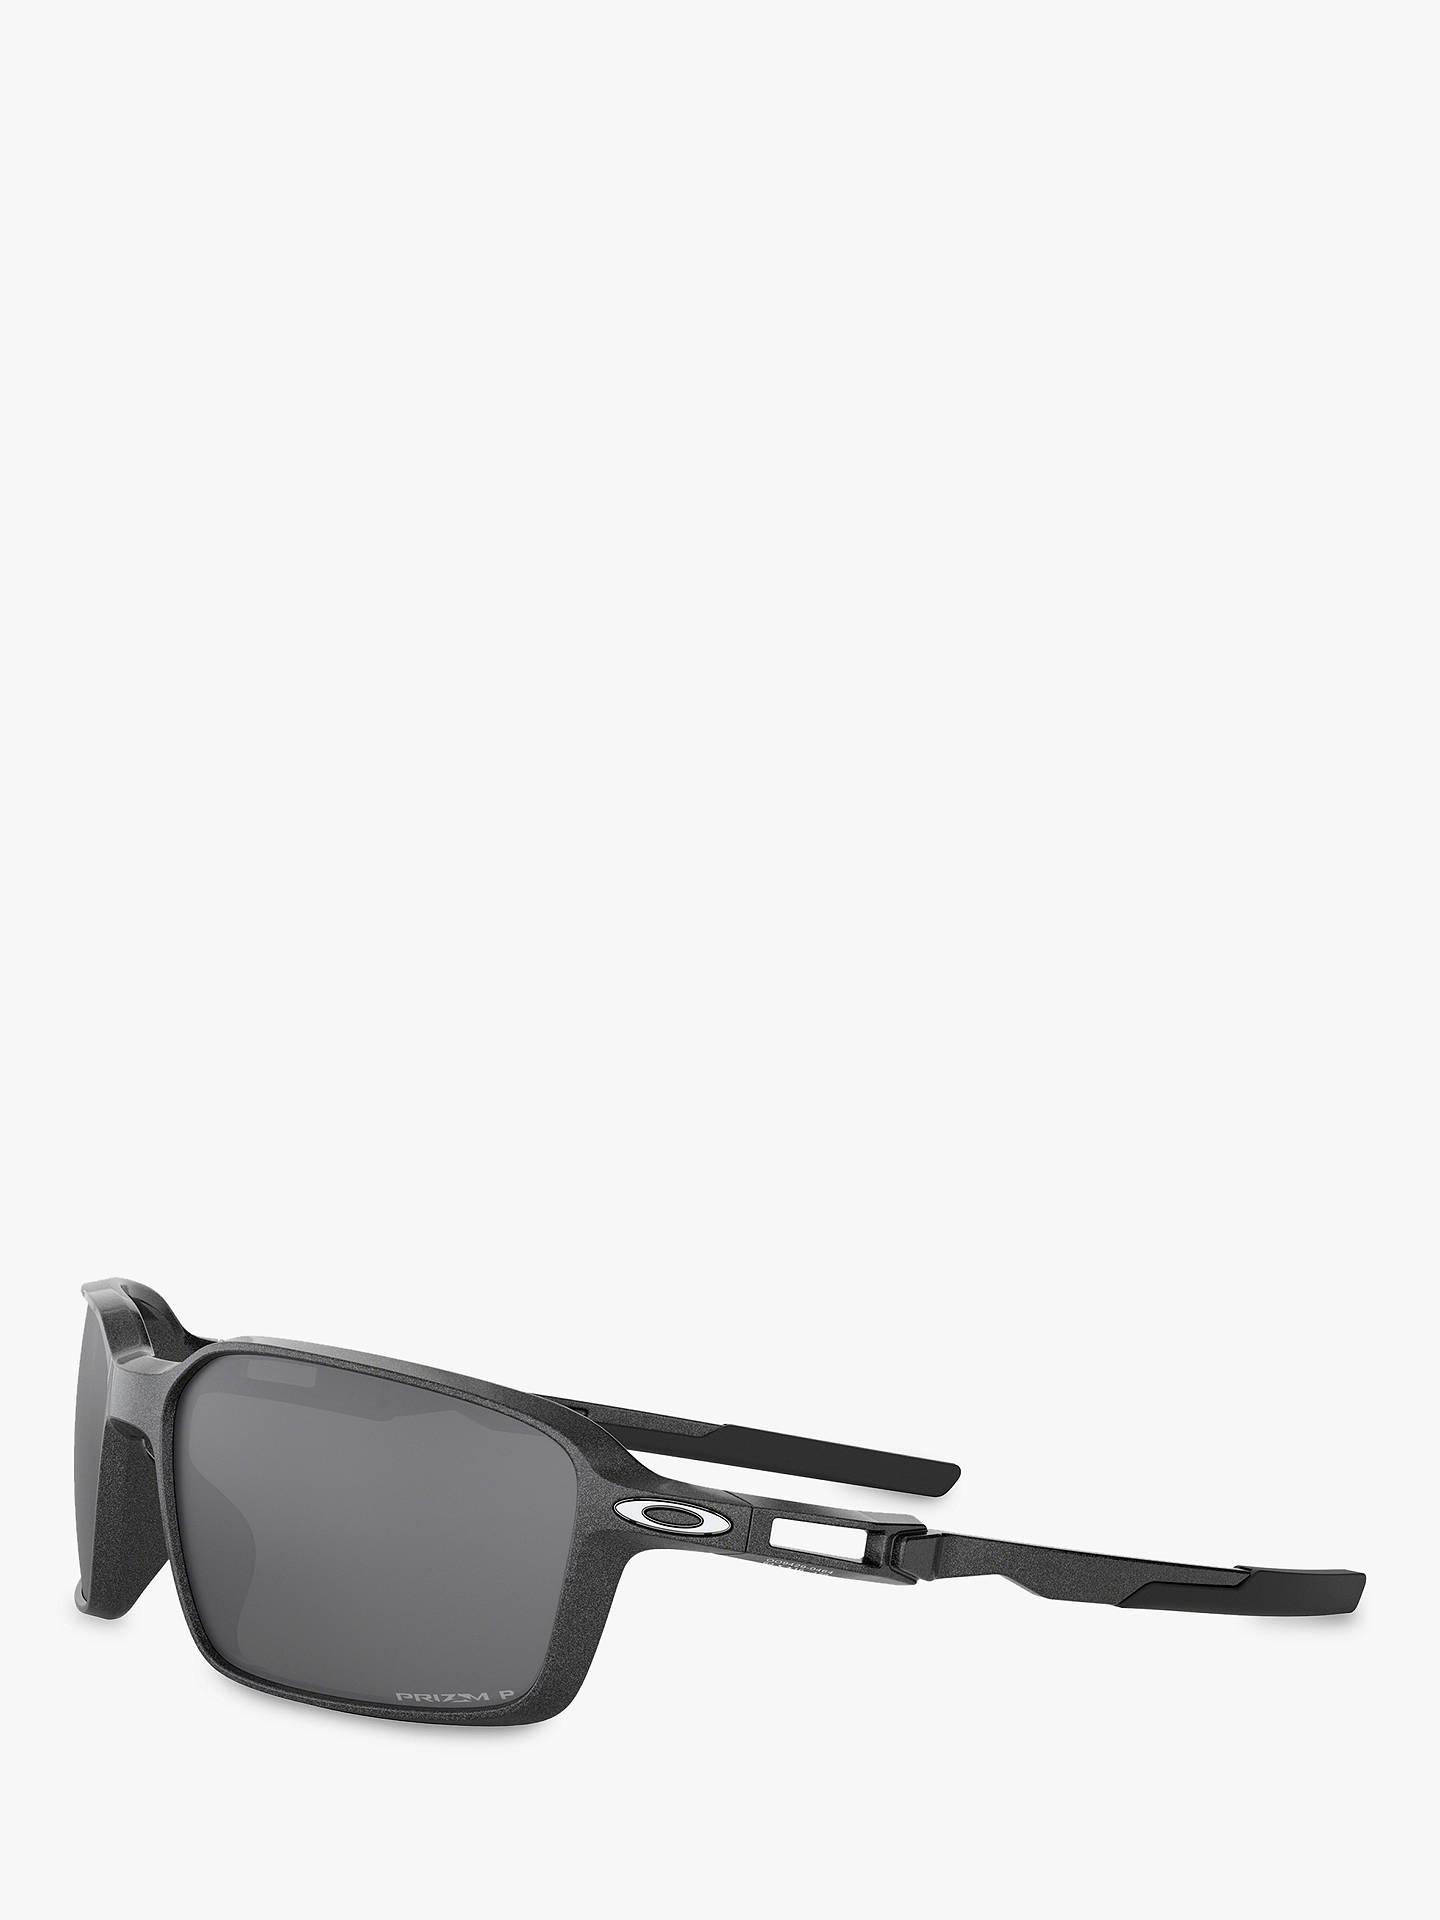 e3bd6ea2155 ... Buy Oakley OO9429 Men s Siphon Prizm Polarised Rectangular Sunglasses